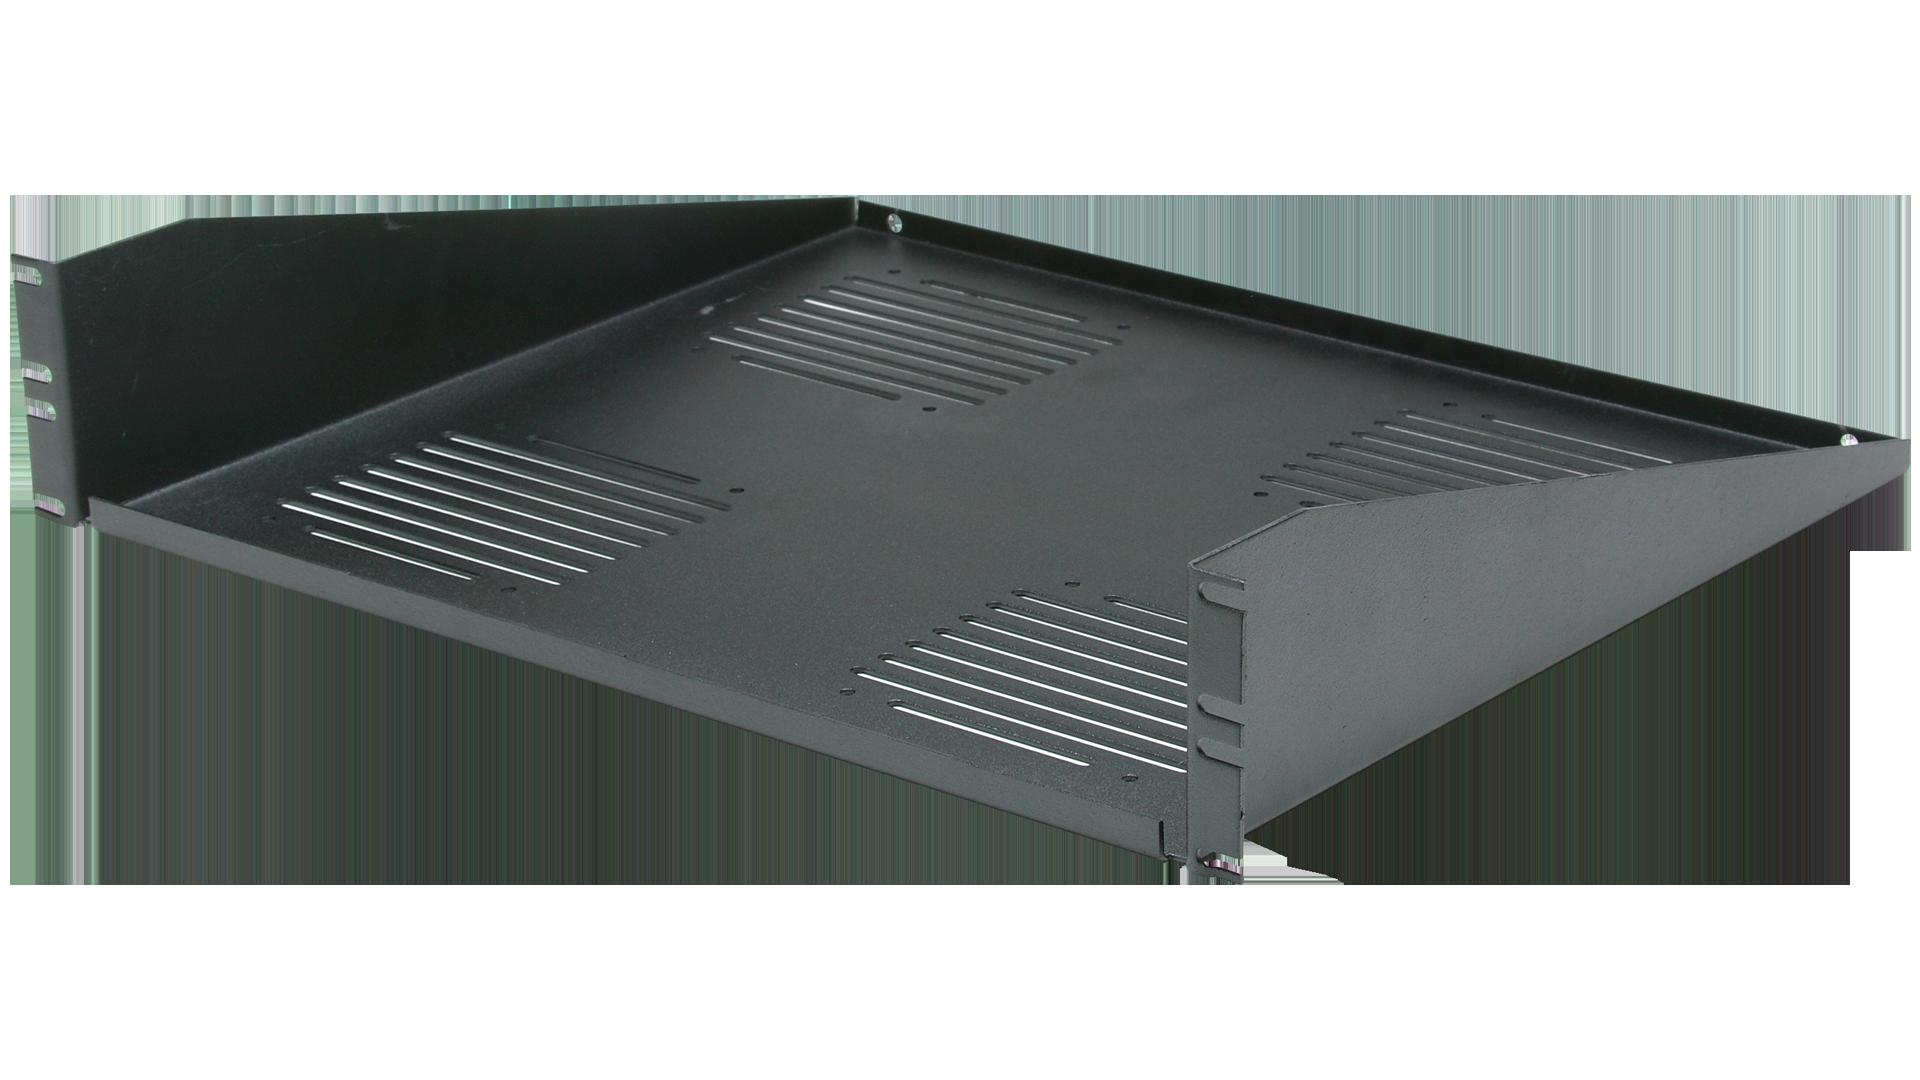 Mor S Rack Mount Vertical Shelves Atx Networks Power Inserters Couplers Rlh Industries